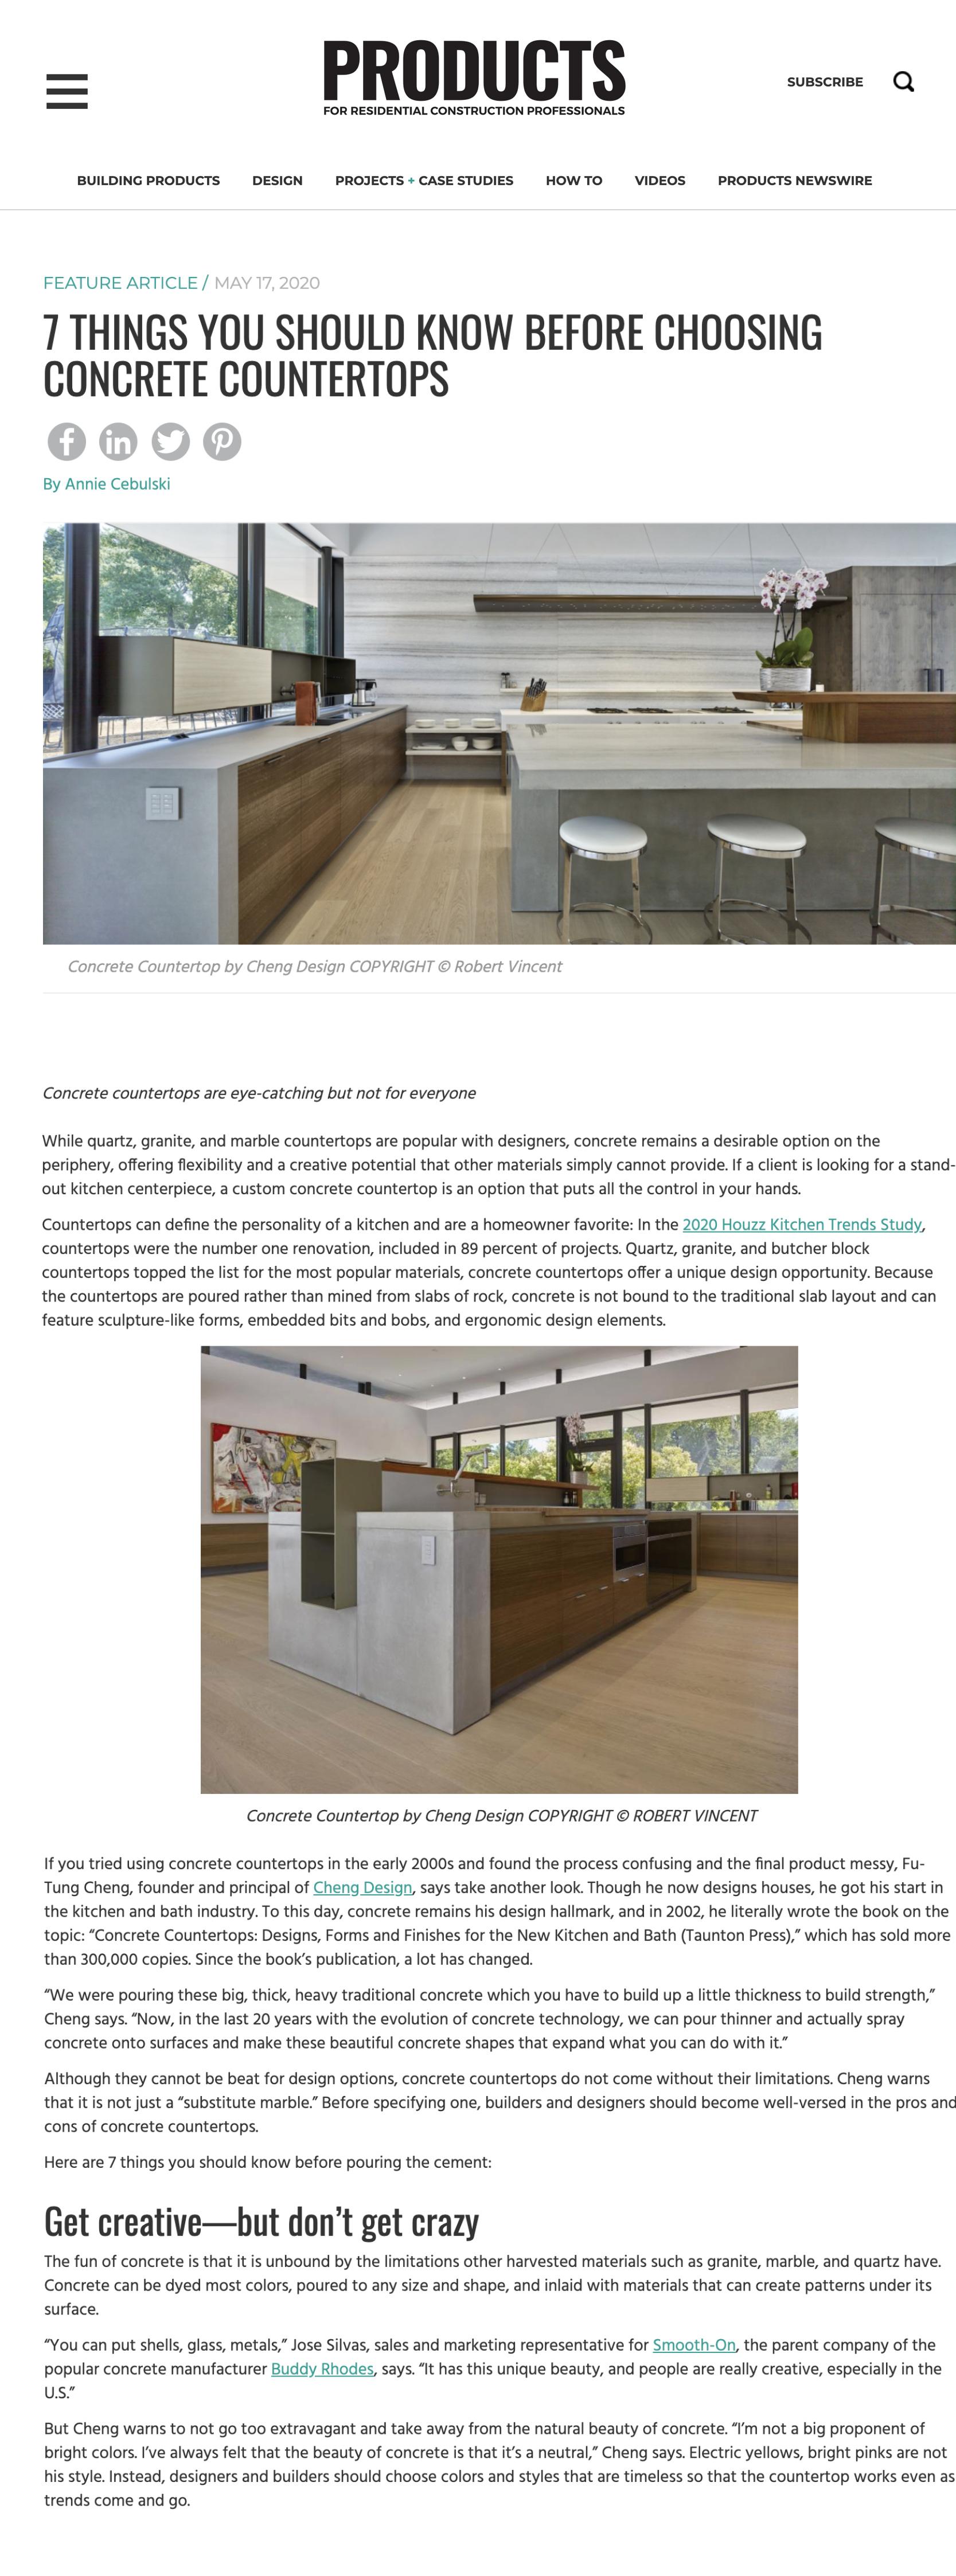 Products Magazine Cheng Design Sustainable Emotional Timeless Design